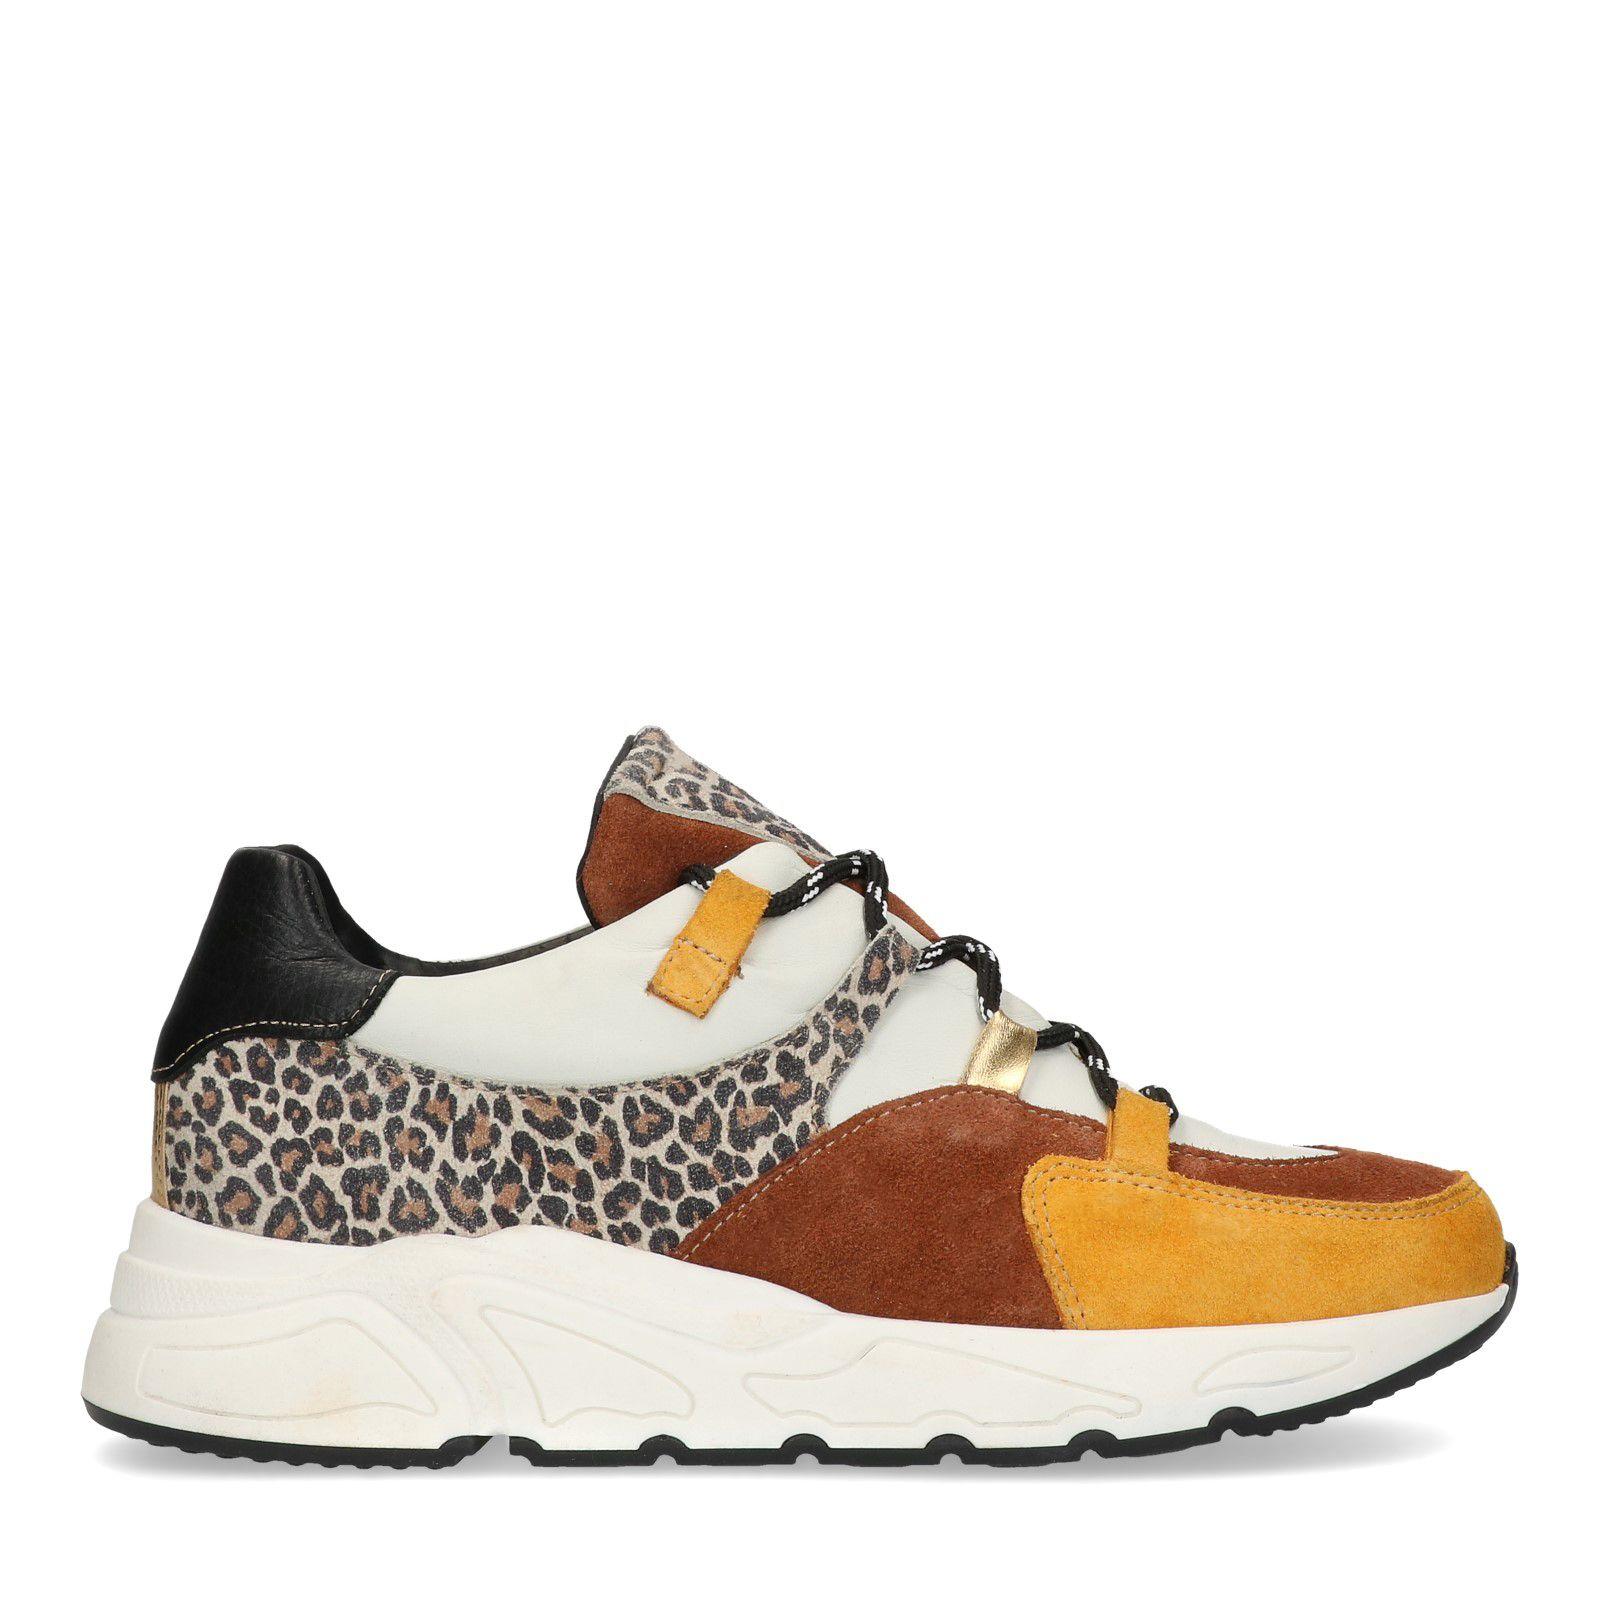 Sneaker Sneaker Leopardenmuster Dad Mit Dad Dad Sneaker Dad Mit Leopardenmuster Mit Leopardenmuster Sneaker USMpzqVG